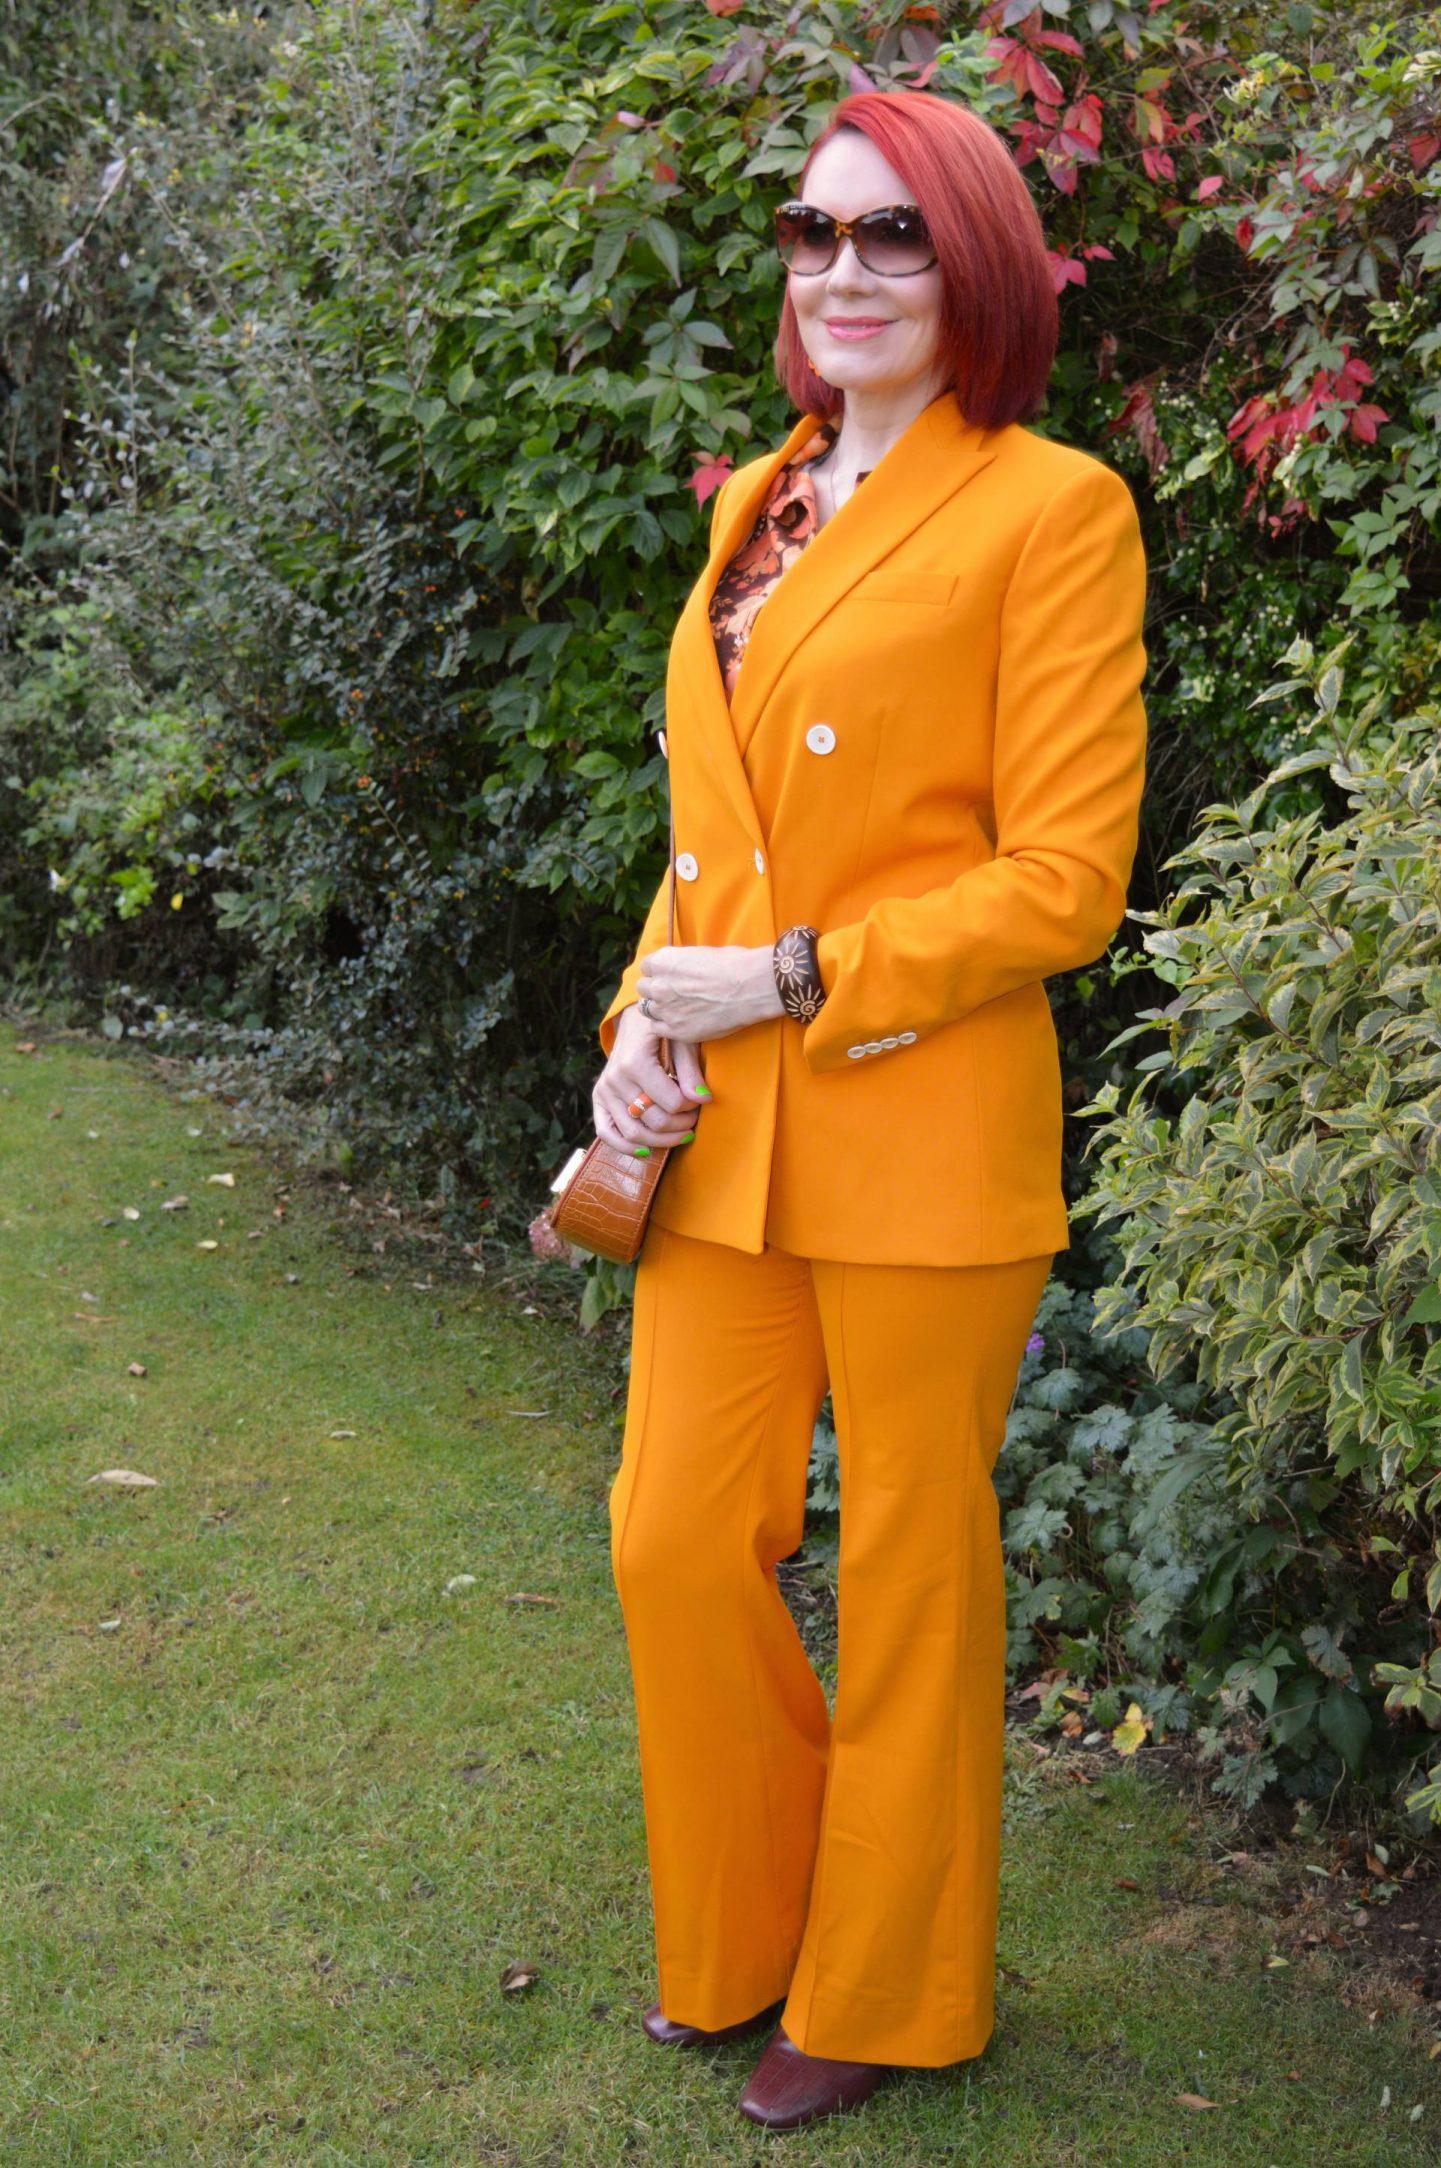 Zara Marigold Trouser Suit and Vintage Shirt